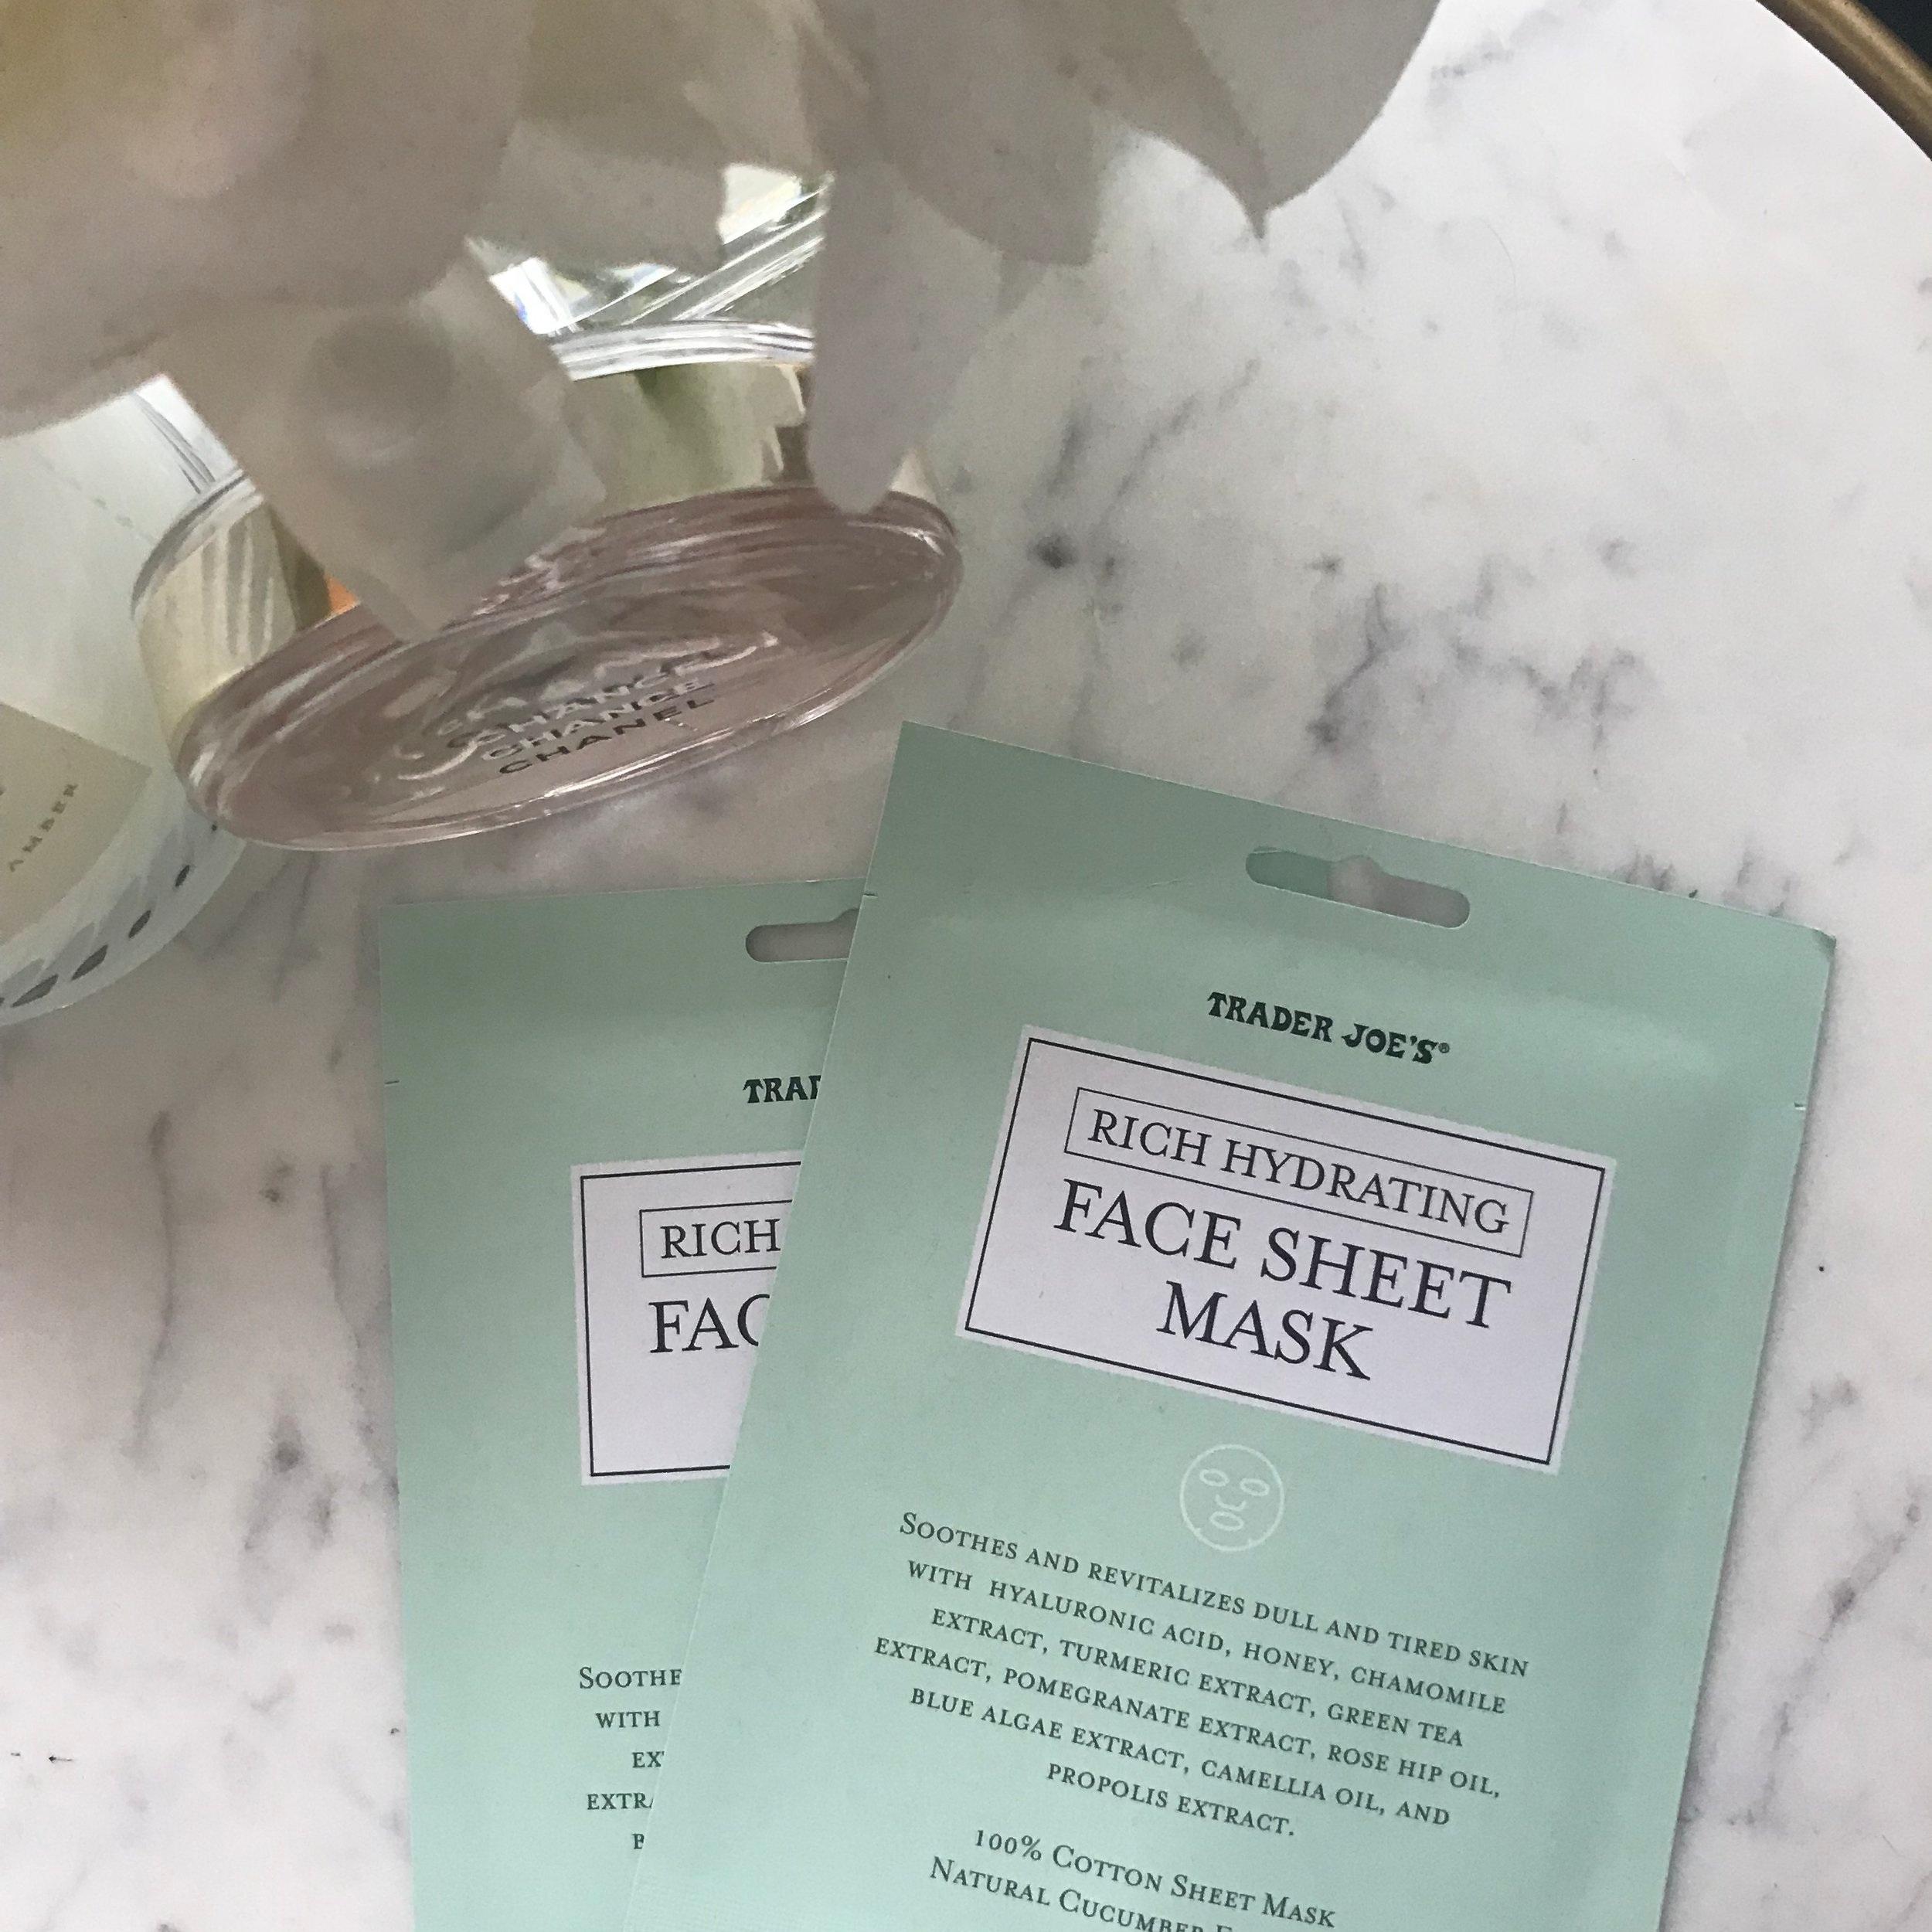 Trader Joe's Rich Hydrating Face Sheet Mask -